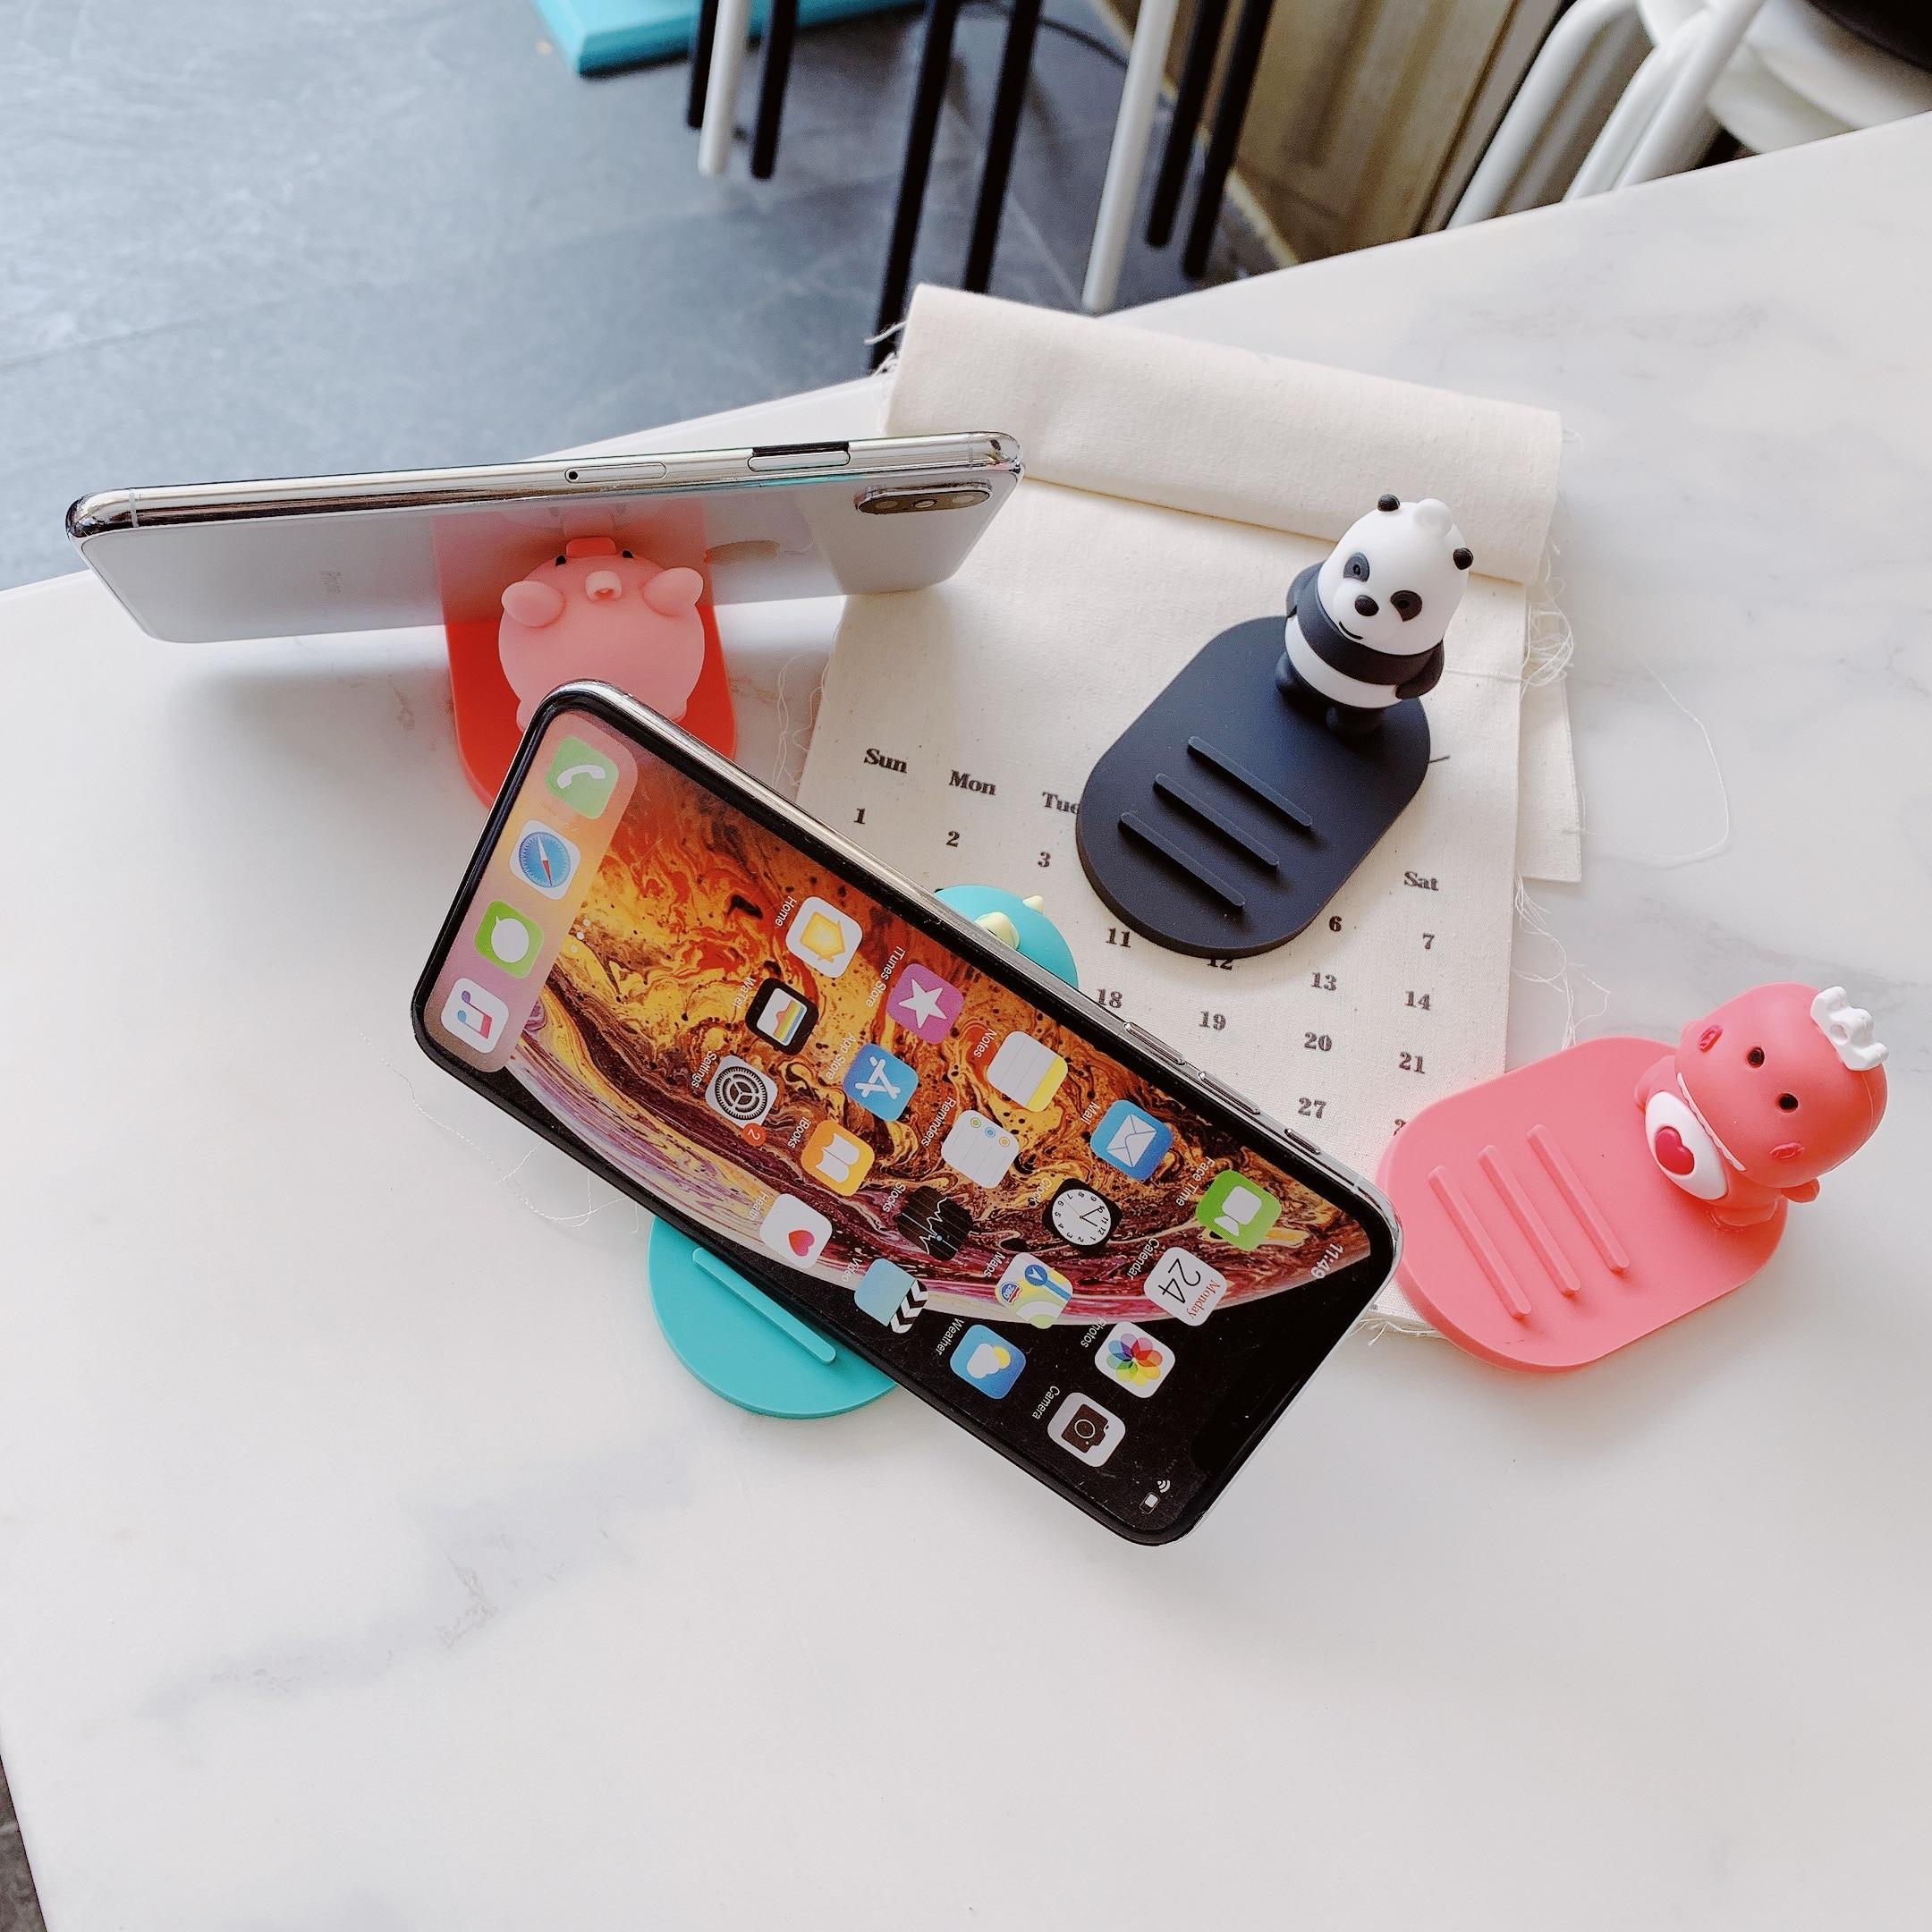 Cartoon Silicone Mobile Phone Holder Loving bear Car Desktop Bracket Multi-function Adjustable Stand Mount Non-slip Cute Stand